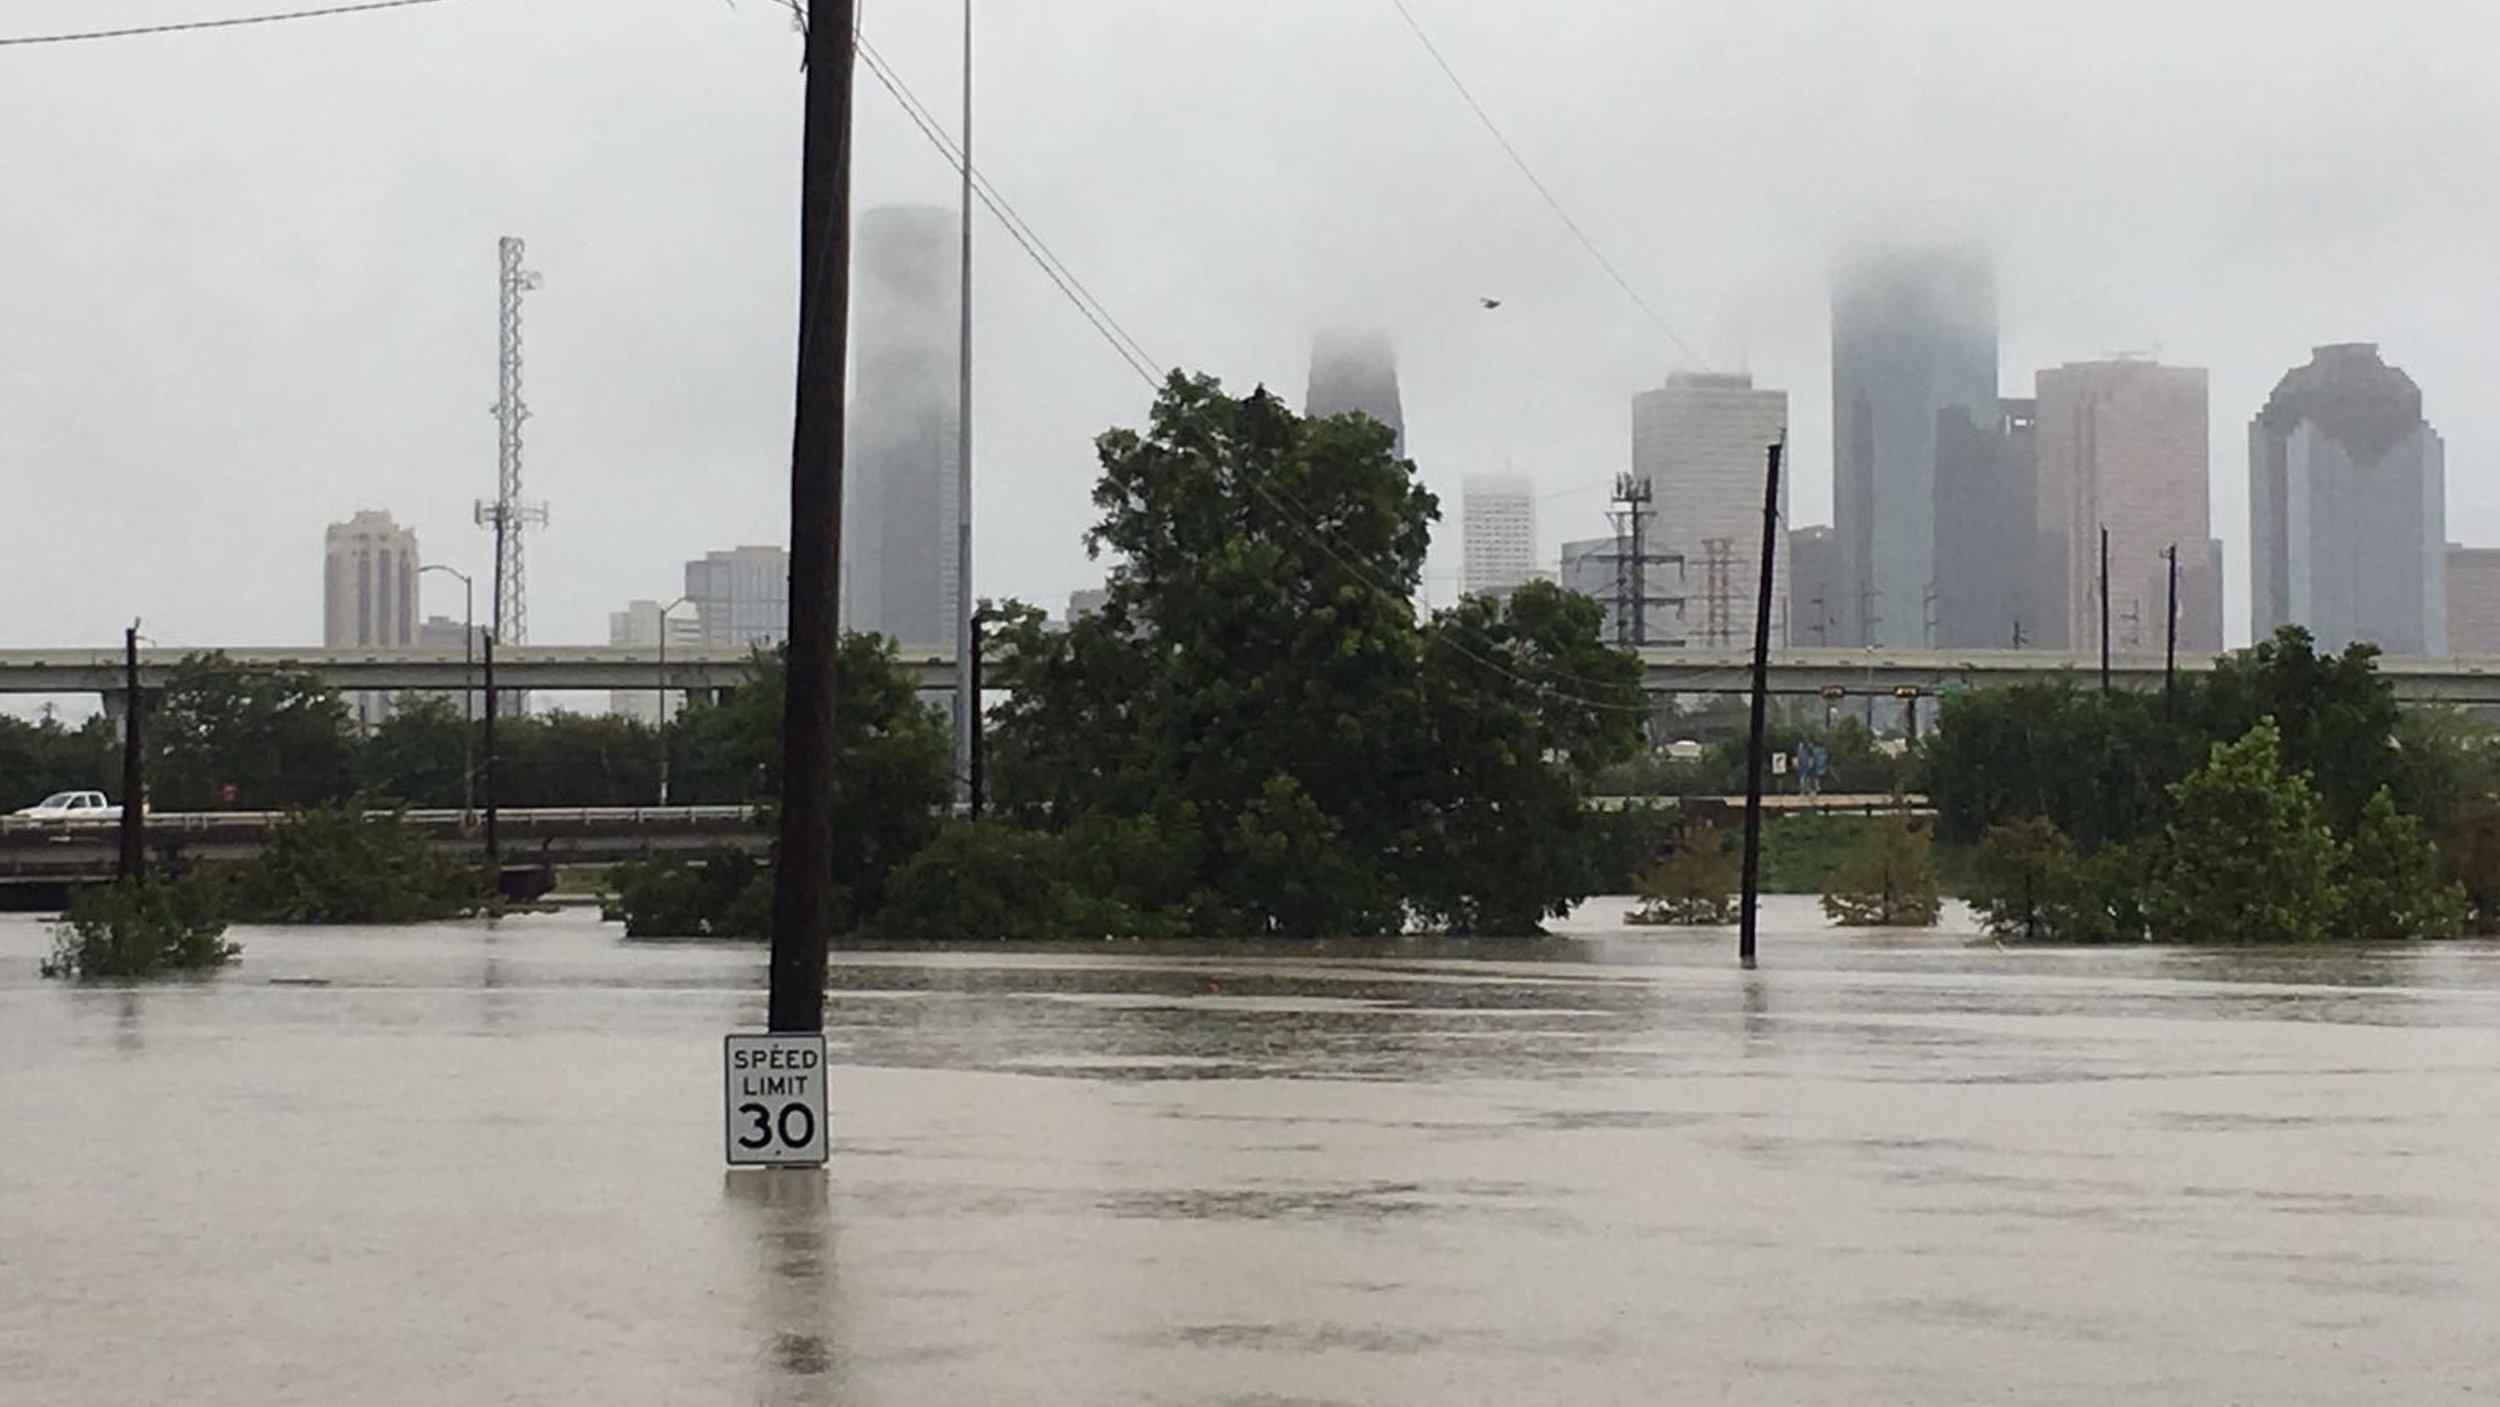 Houston, TX during Hurricane Harvey. (Photo by Cristina Mandujano)